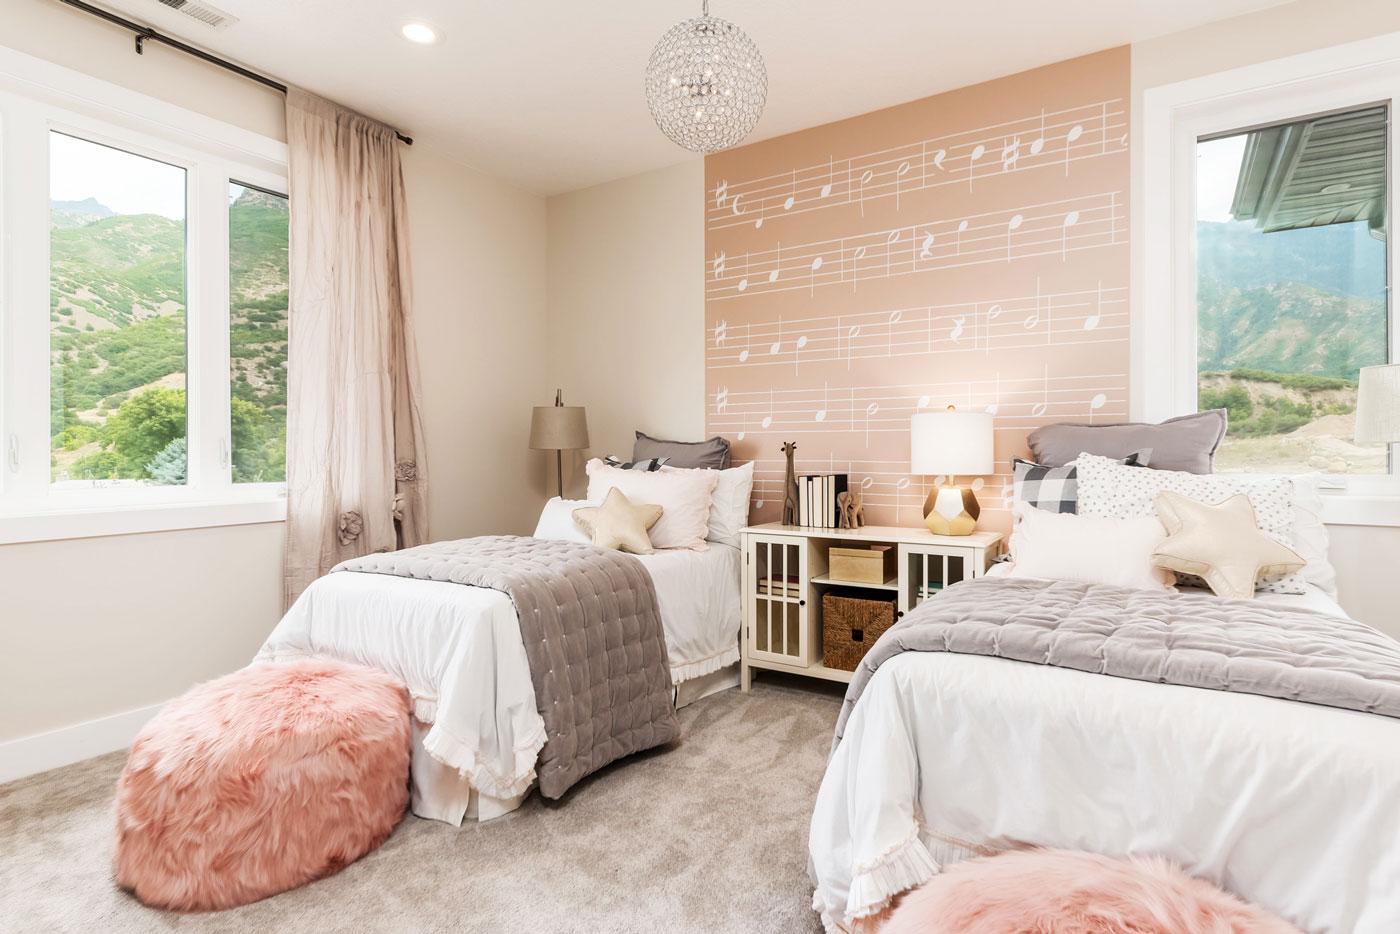 Interior Design And Merchandising Of Model Homes Lita Dirks Co